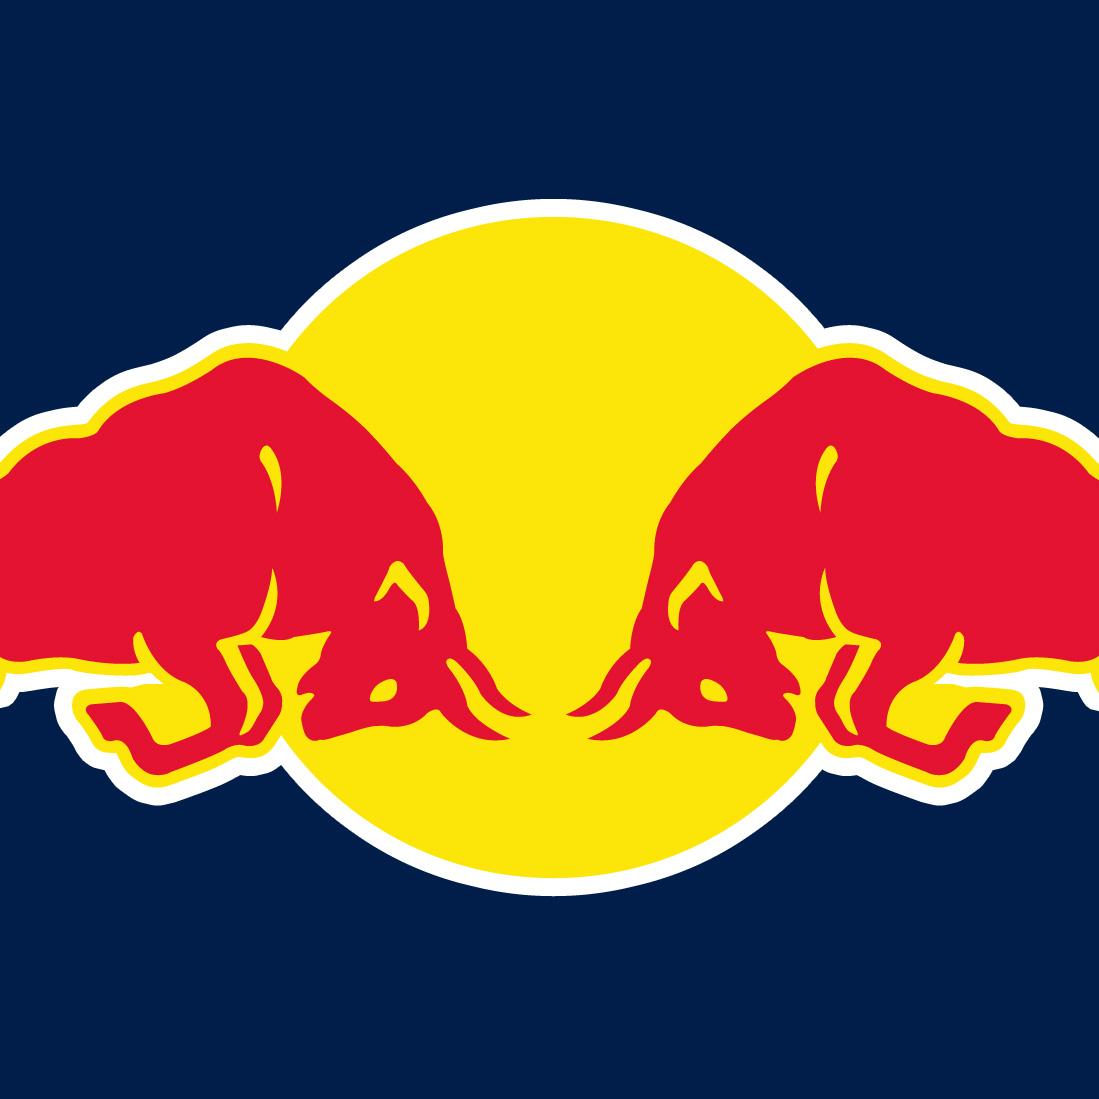 Red Bull and FuturoCoin confirm new F1 partnership